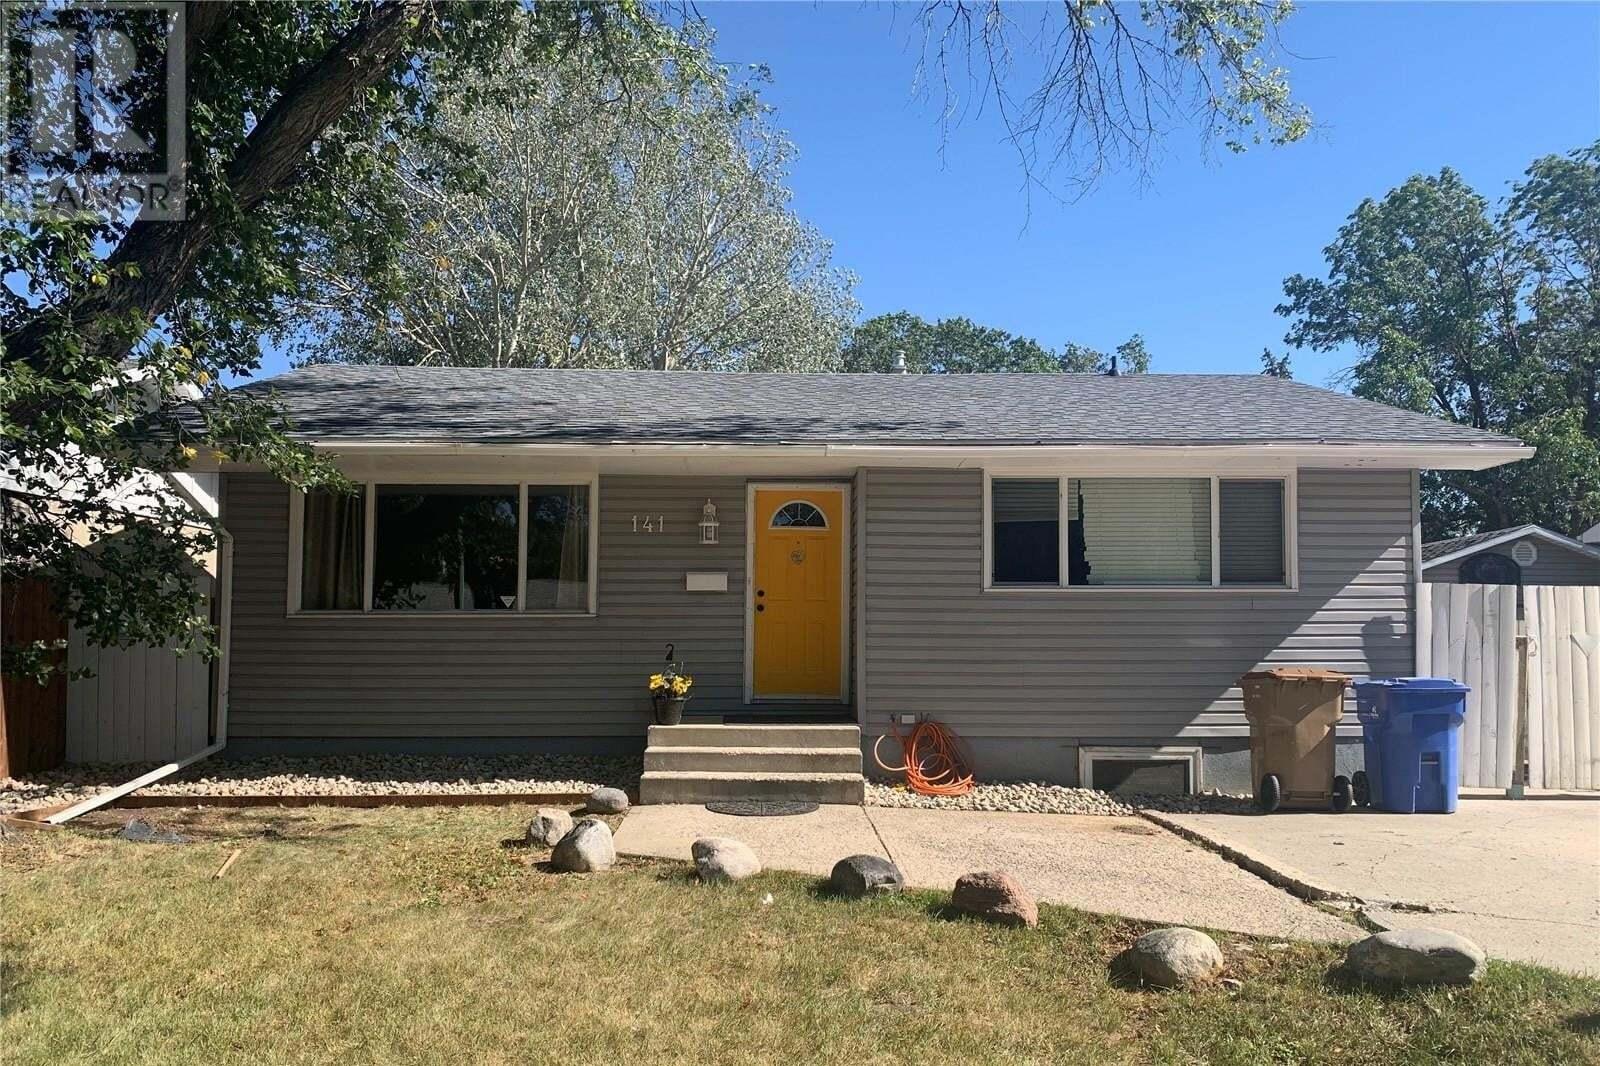 House for sale at 141 Mcdougall Cres Regina Saskatchewan - MLS: SK826419